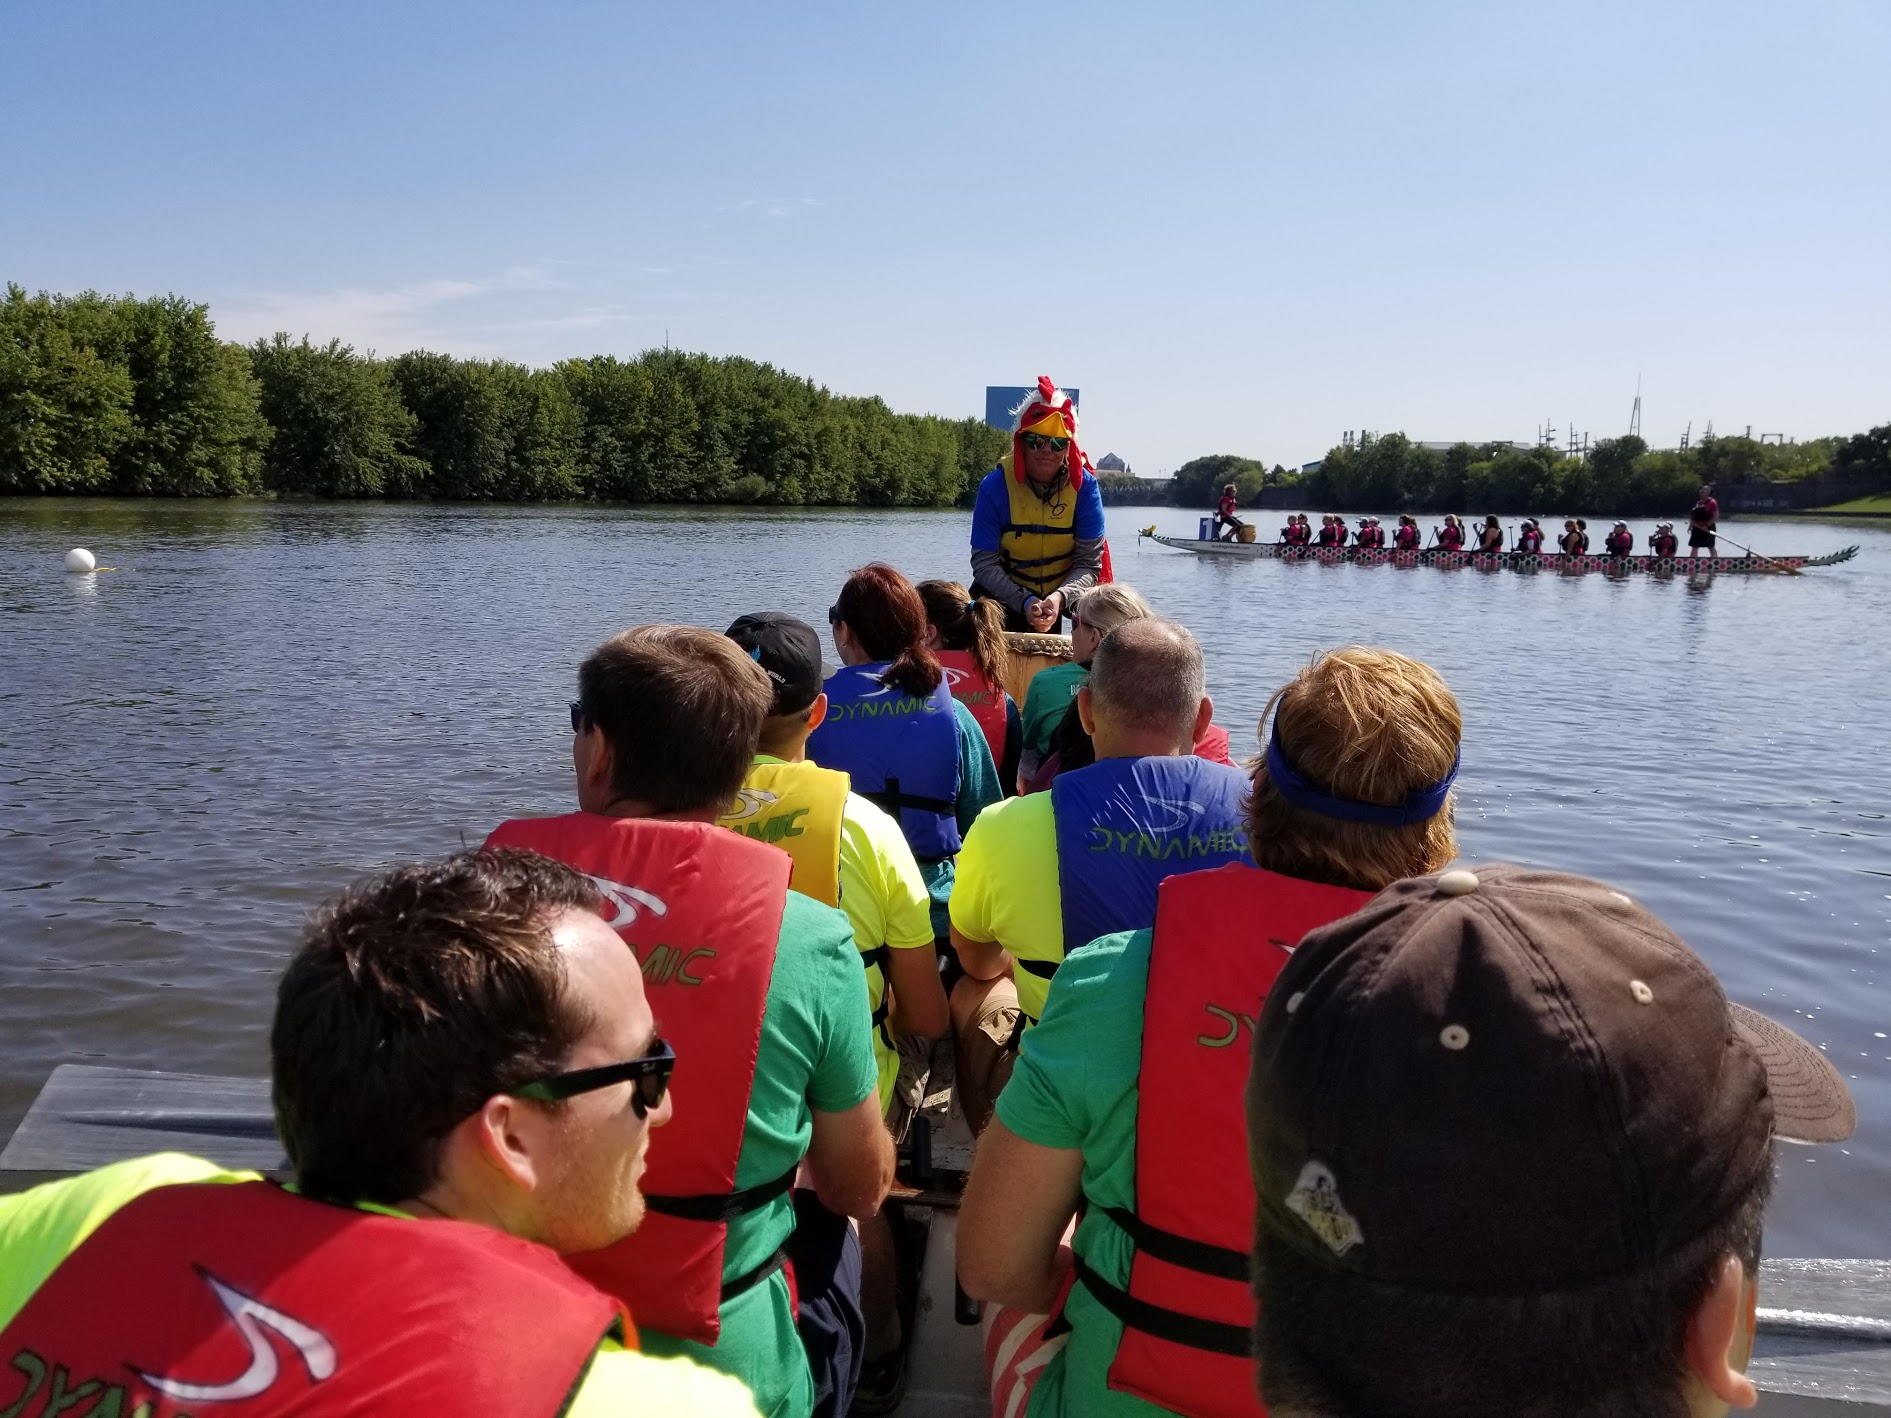 White River Dragon Boat Race - KERAMIDA / Plews, Shadley, Racher, and Braun / City of Carmel Team